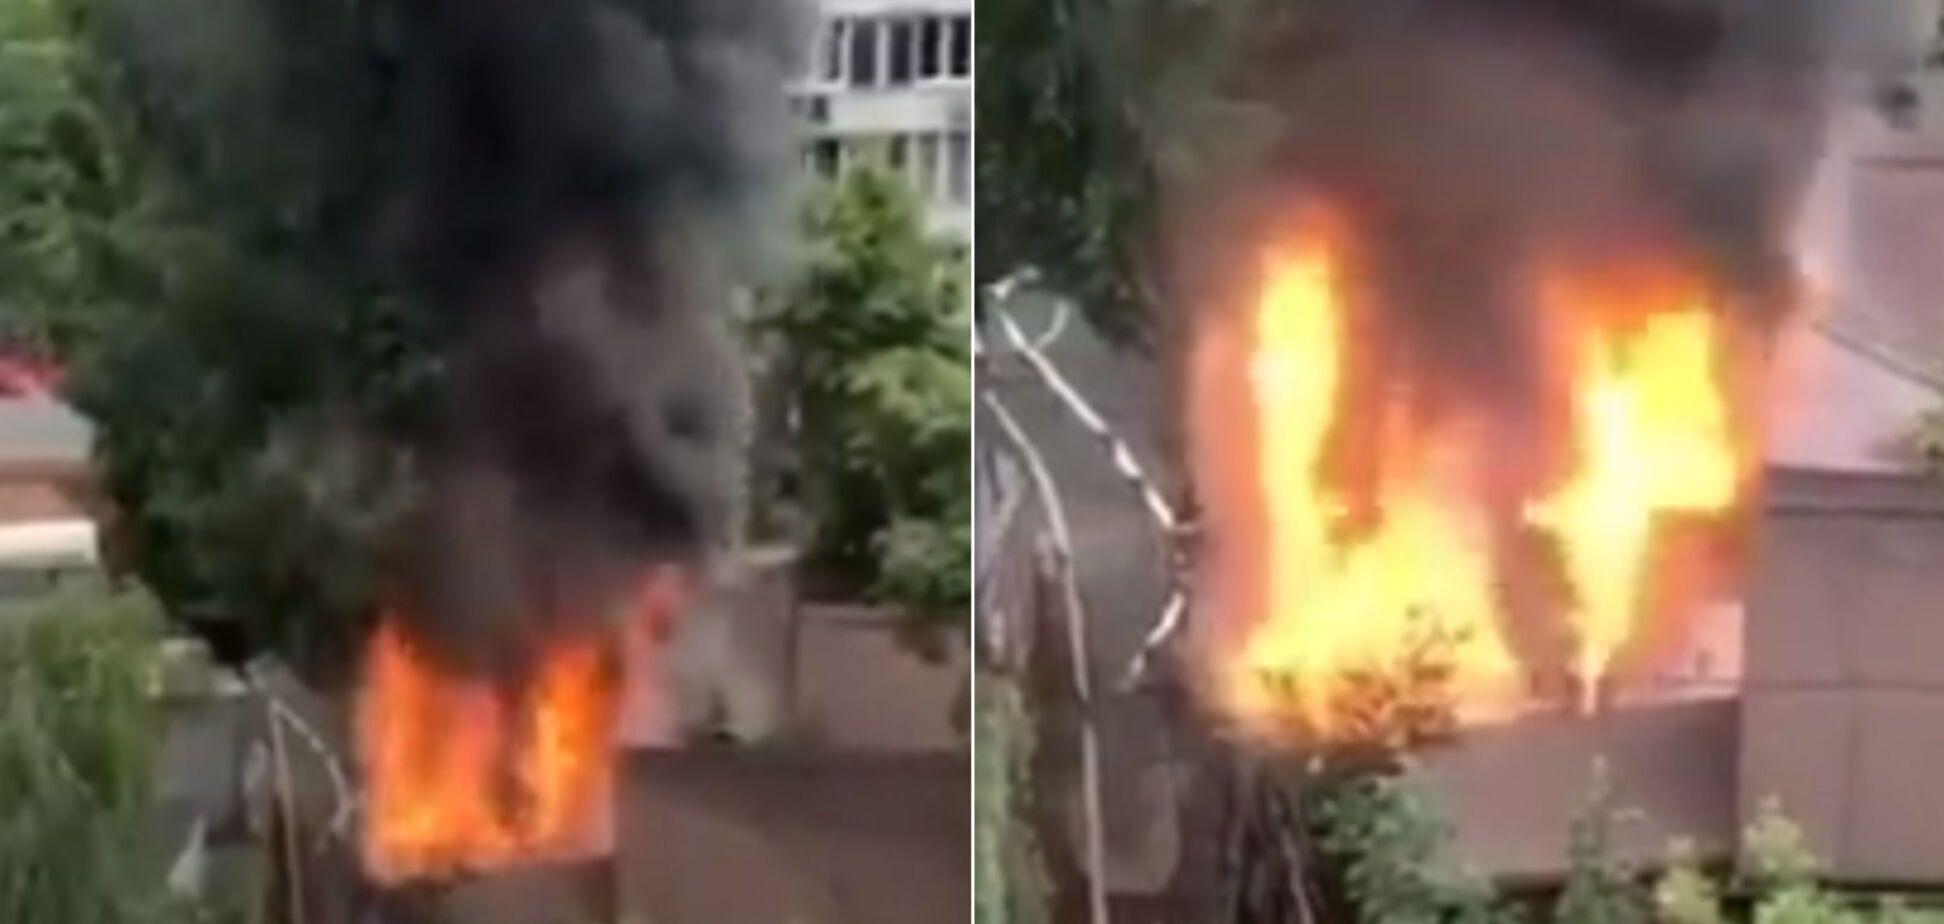 У ресторані Києва спалахнула масштабна пожежа